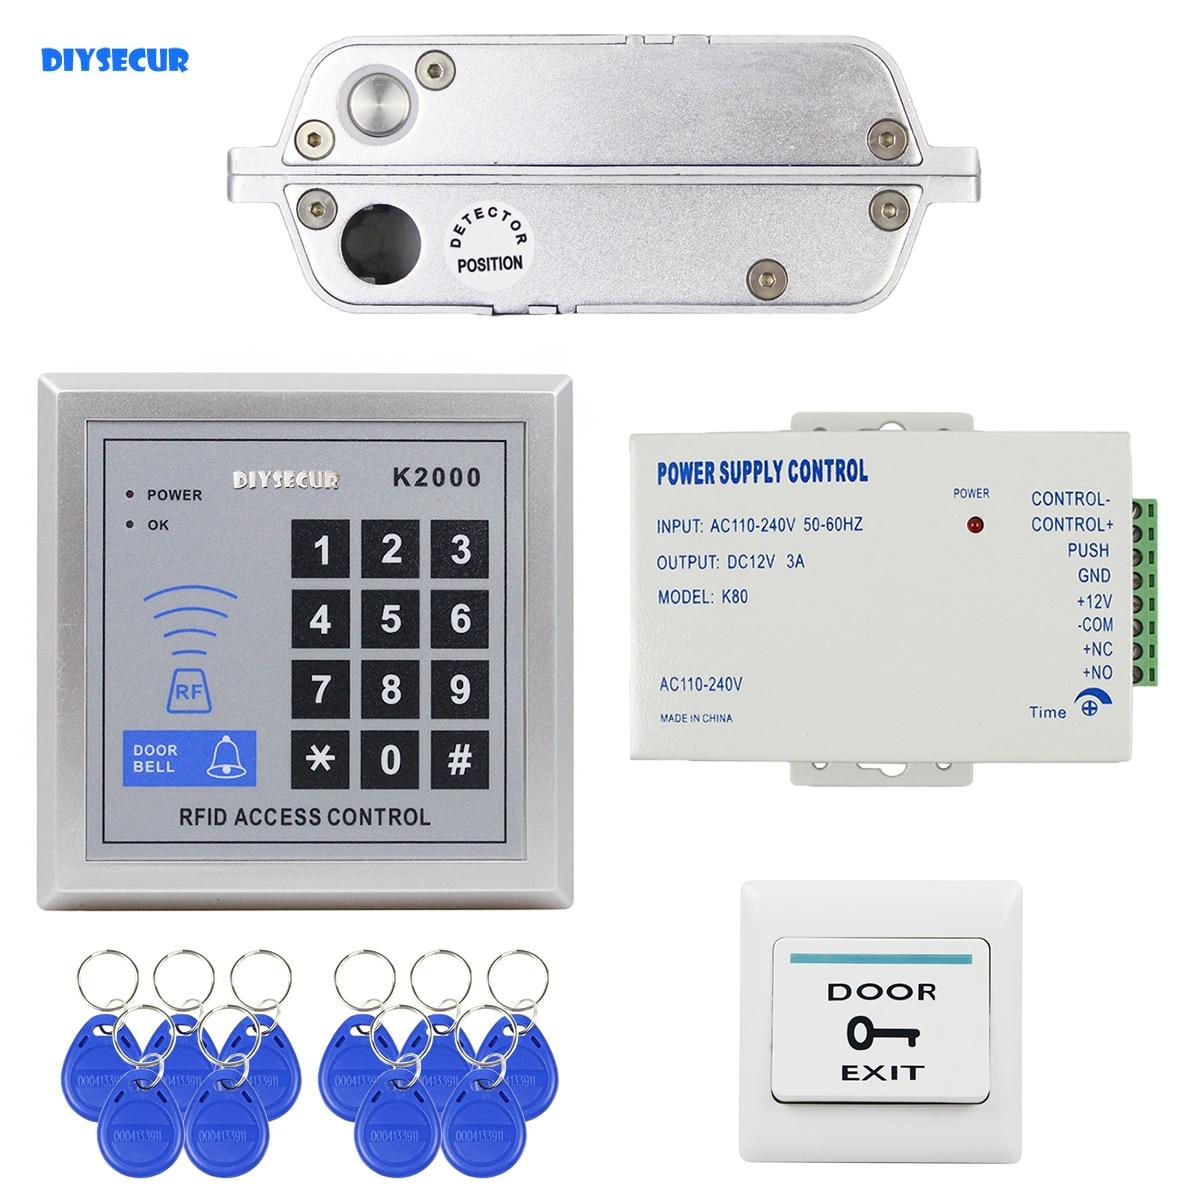 DIYSECUR 125KHz RFID Password Keypad Access Control Security System Full Kit Set Electric Drop Bolt Lock